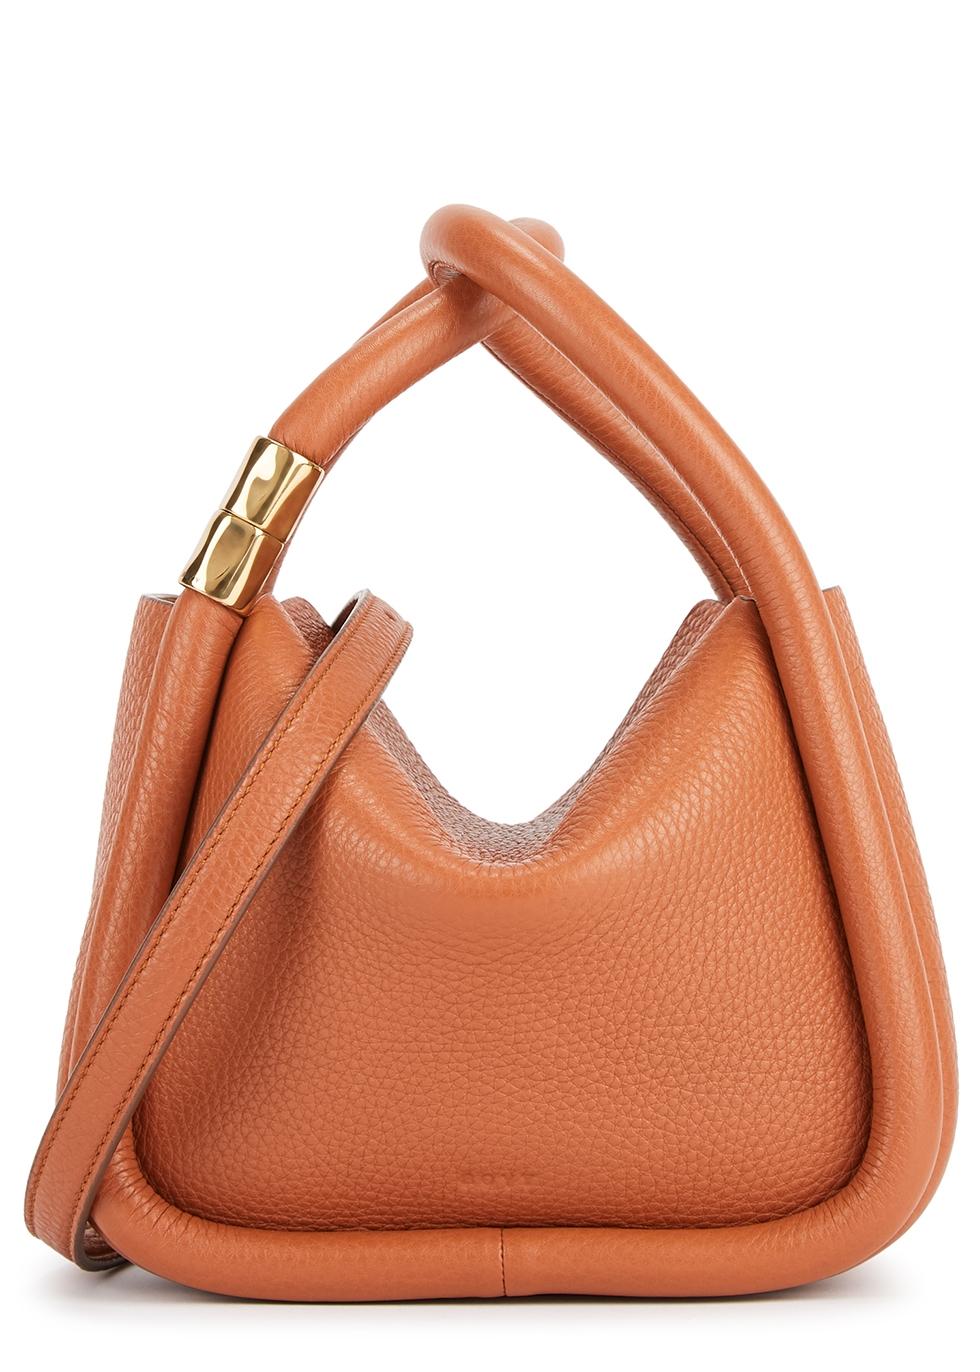 Wonton 20 Pebble leather top handle bag